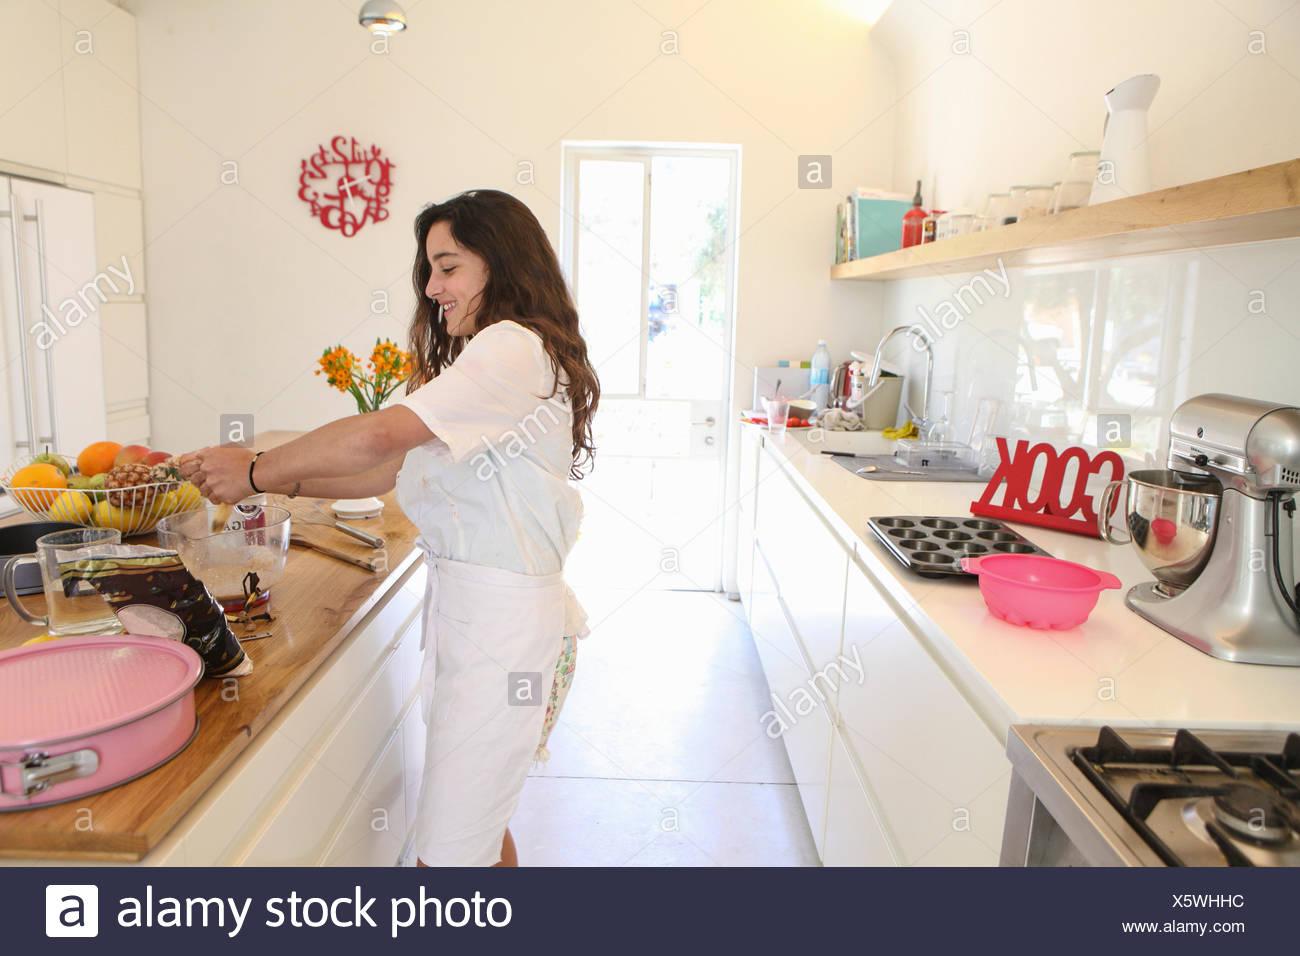 Teenage girl in white apron baking cake in kitchen - Stock Image